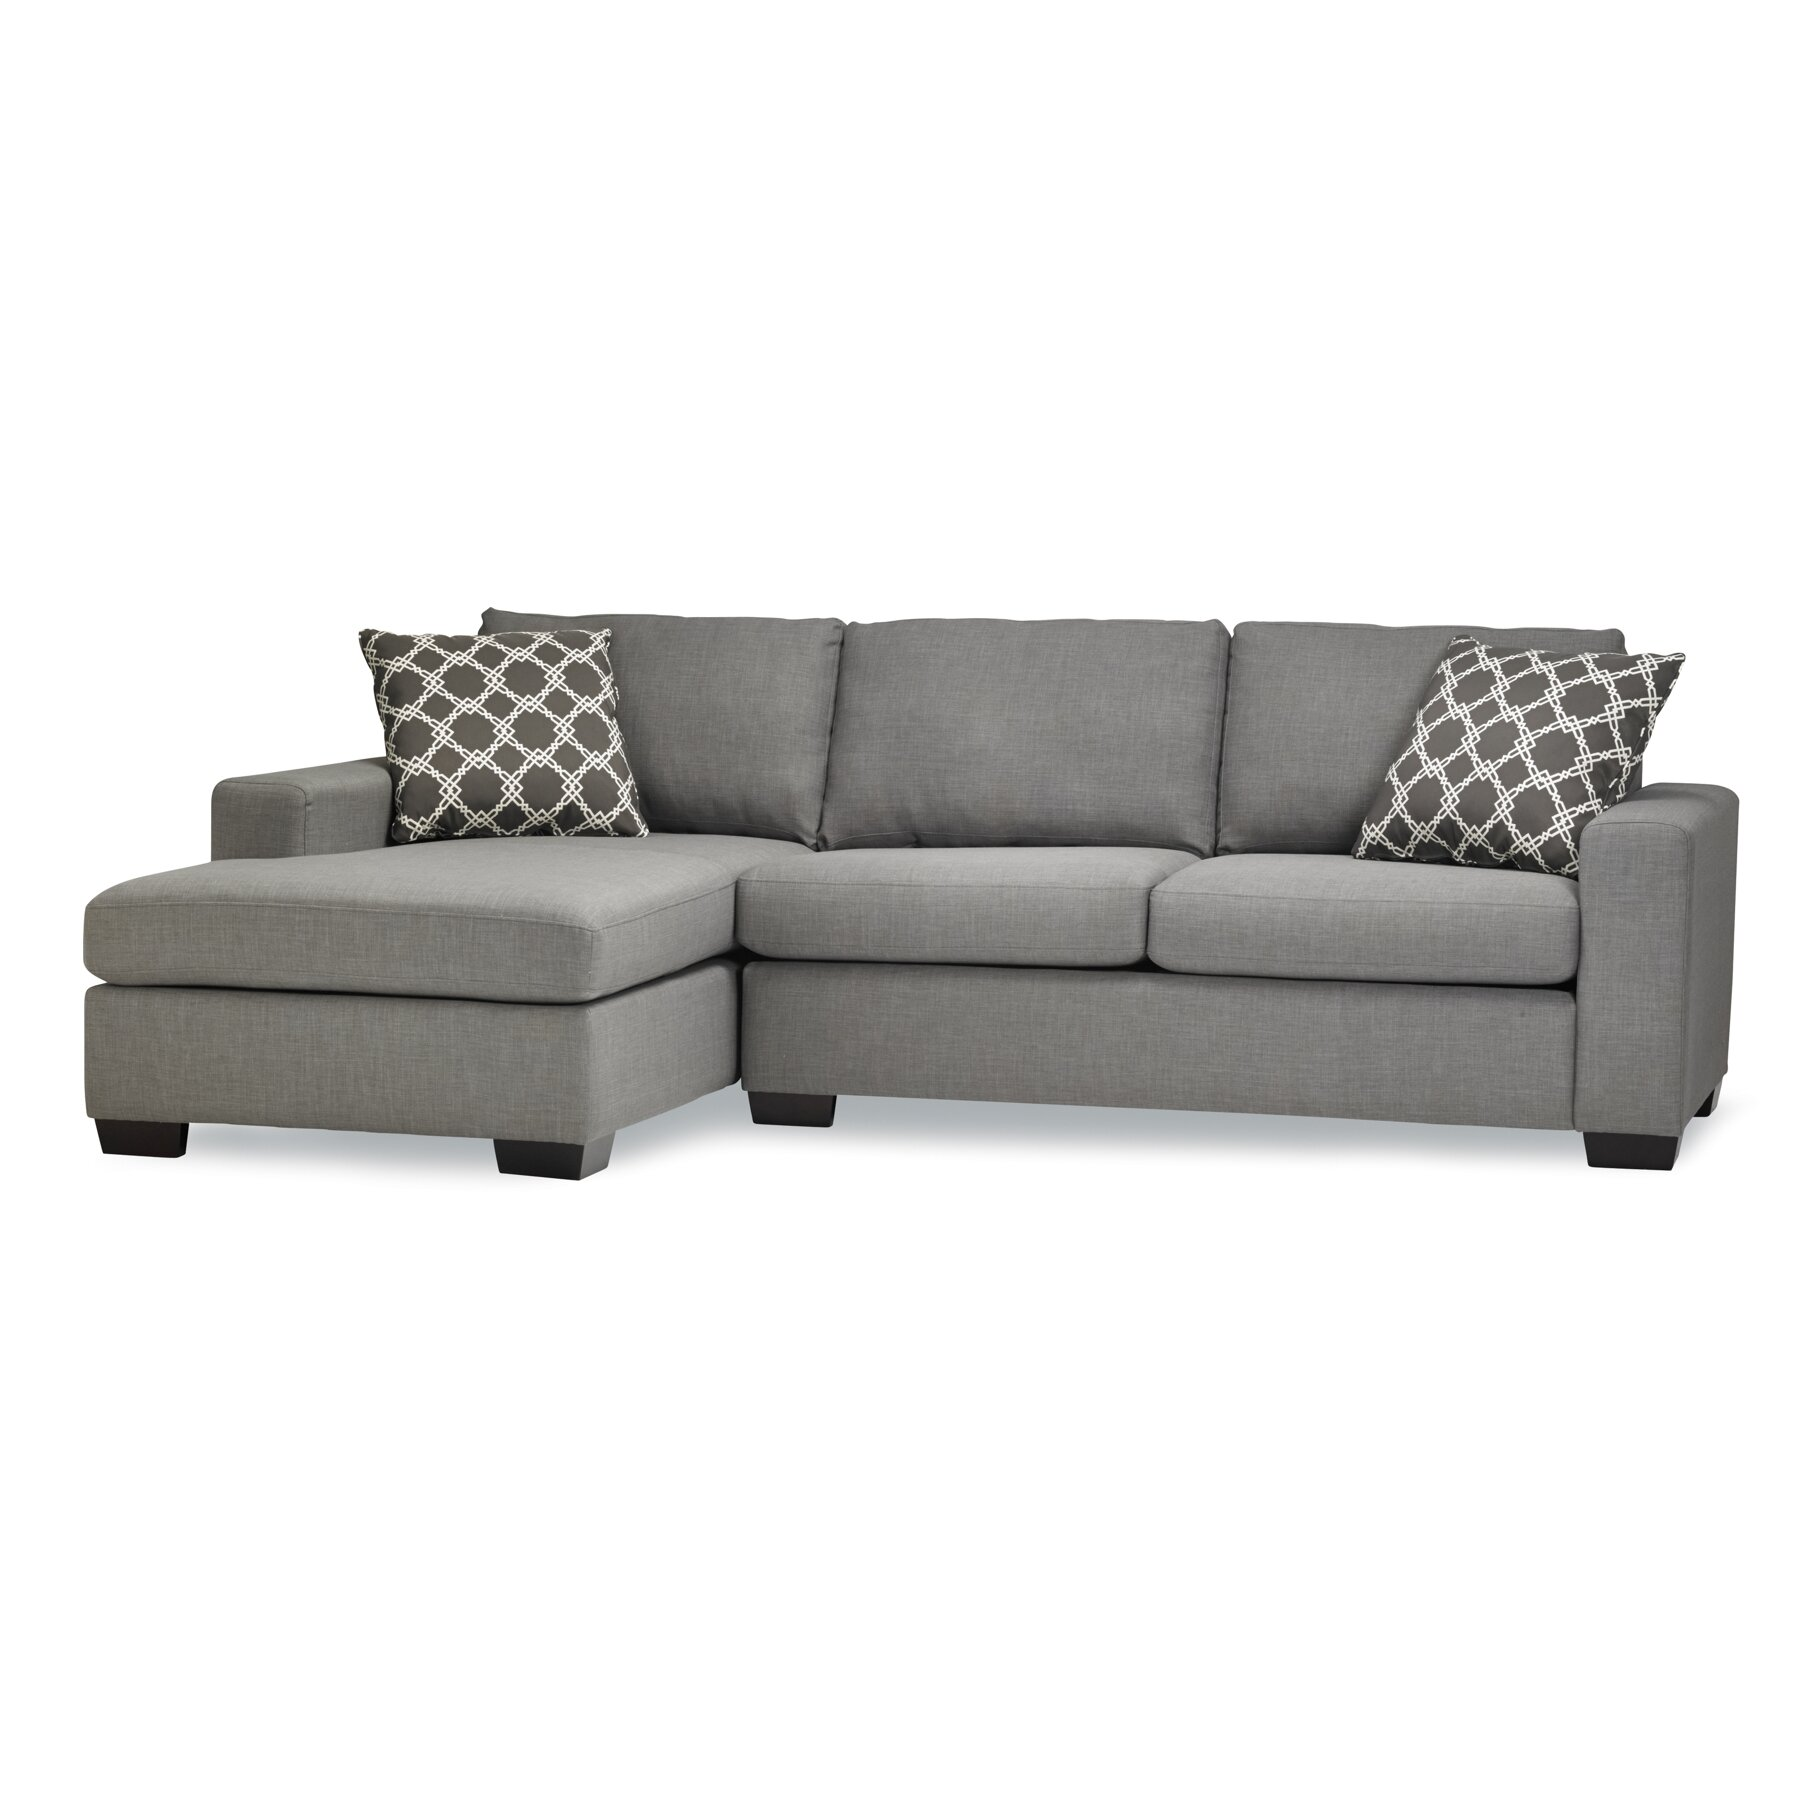 mimi sleeper sectional wayfair. Black Bedroom Furniture Sets. Home Design Ideas